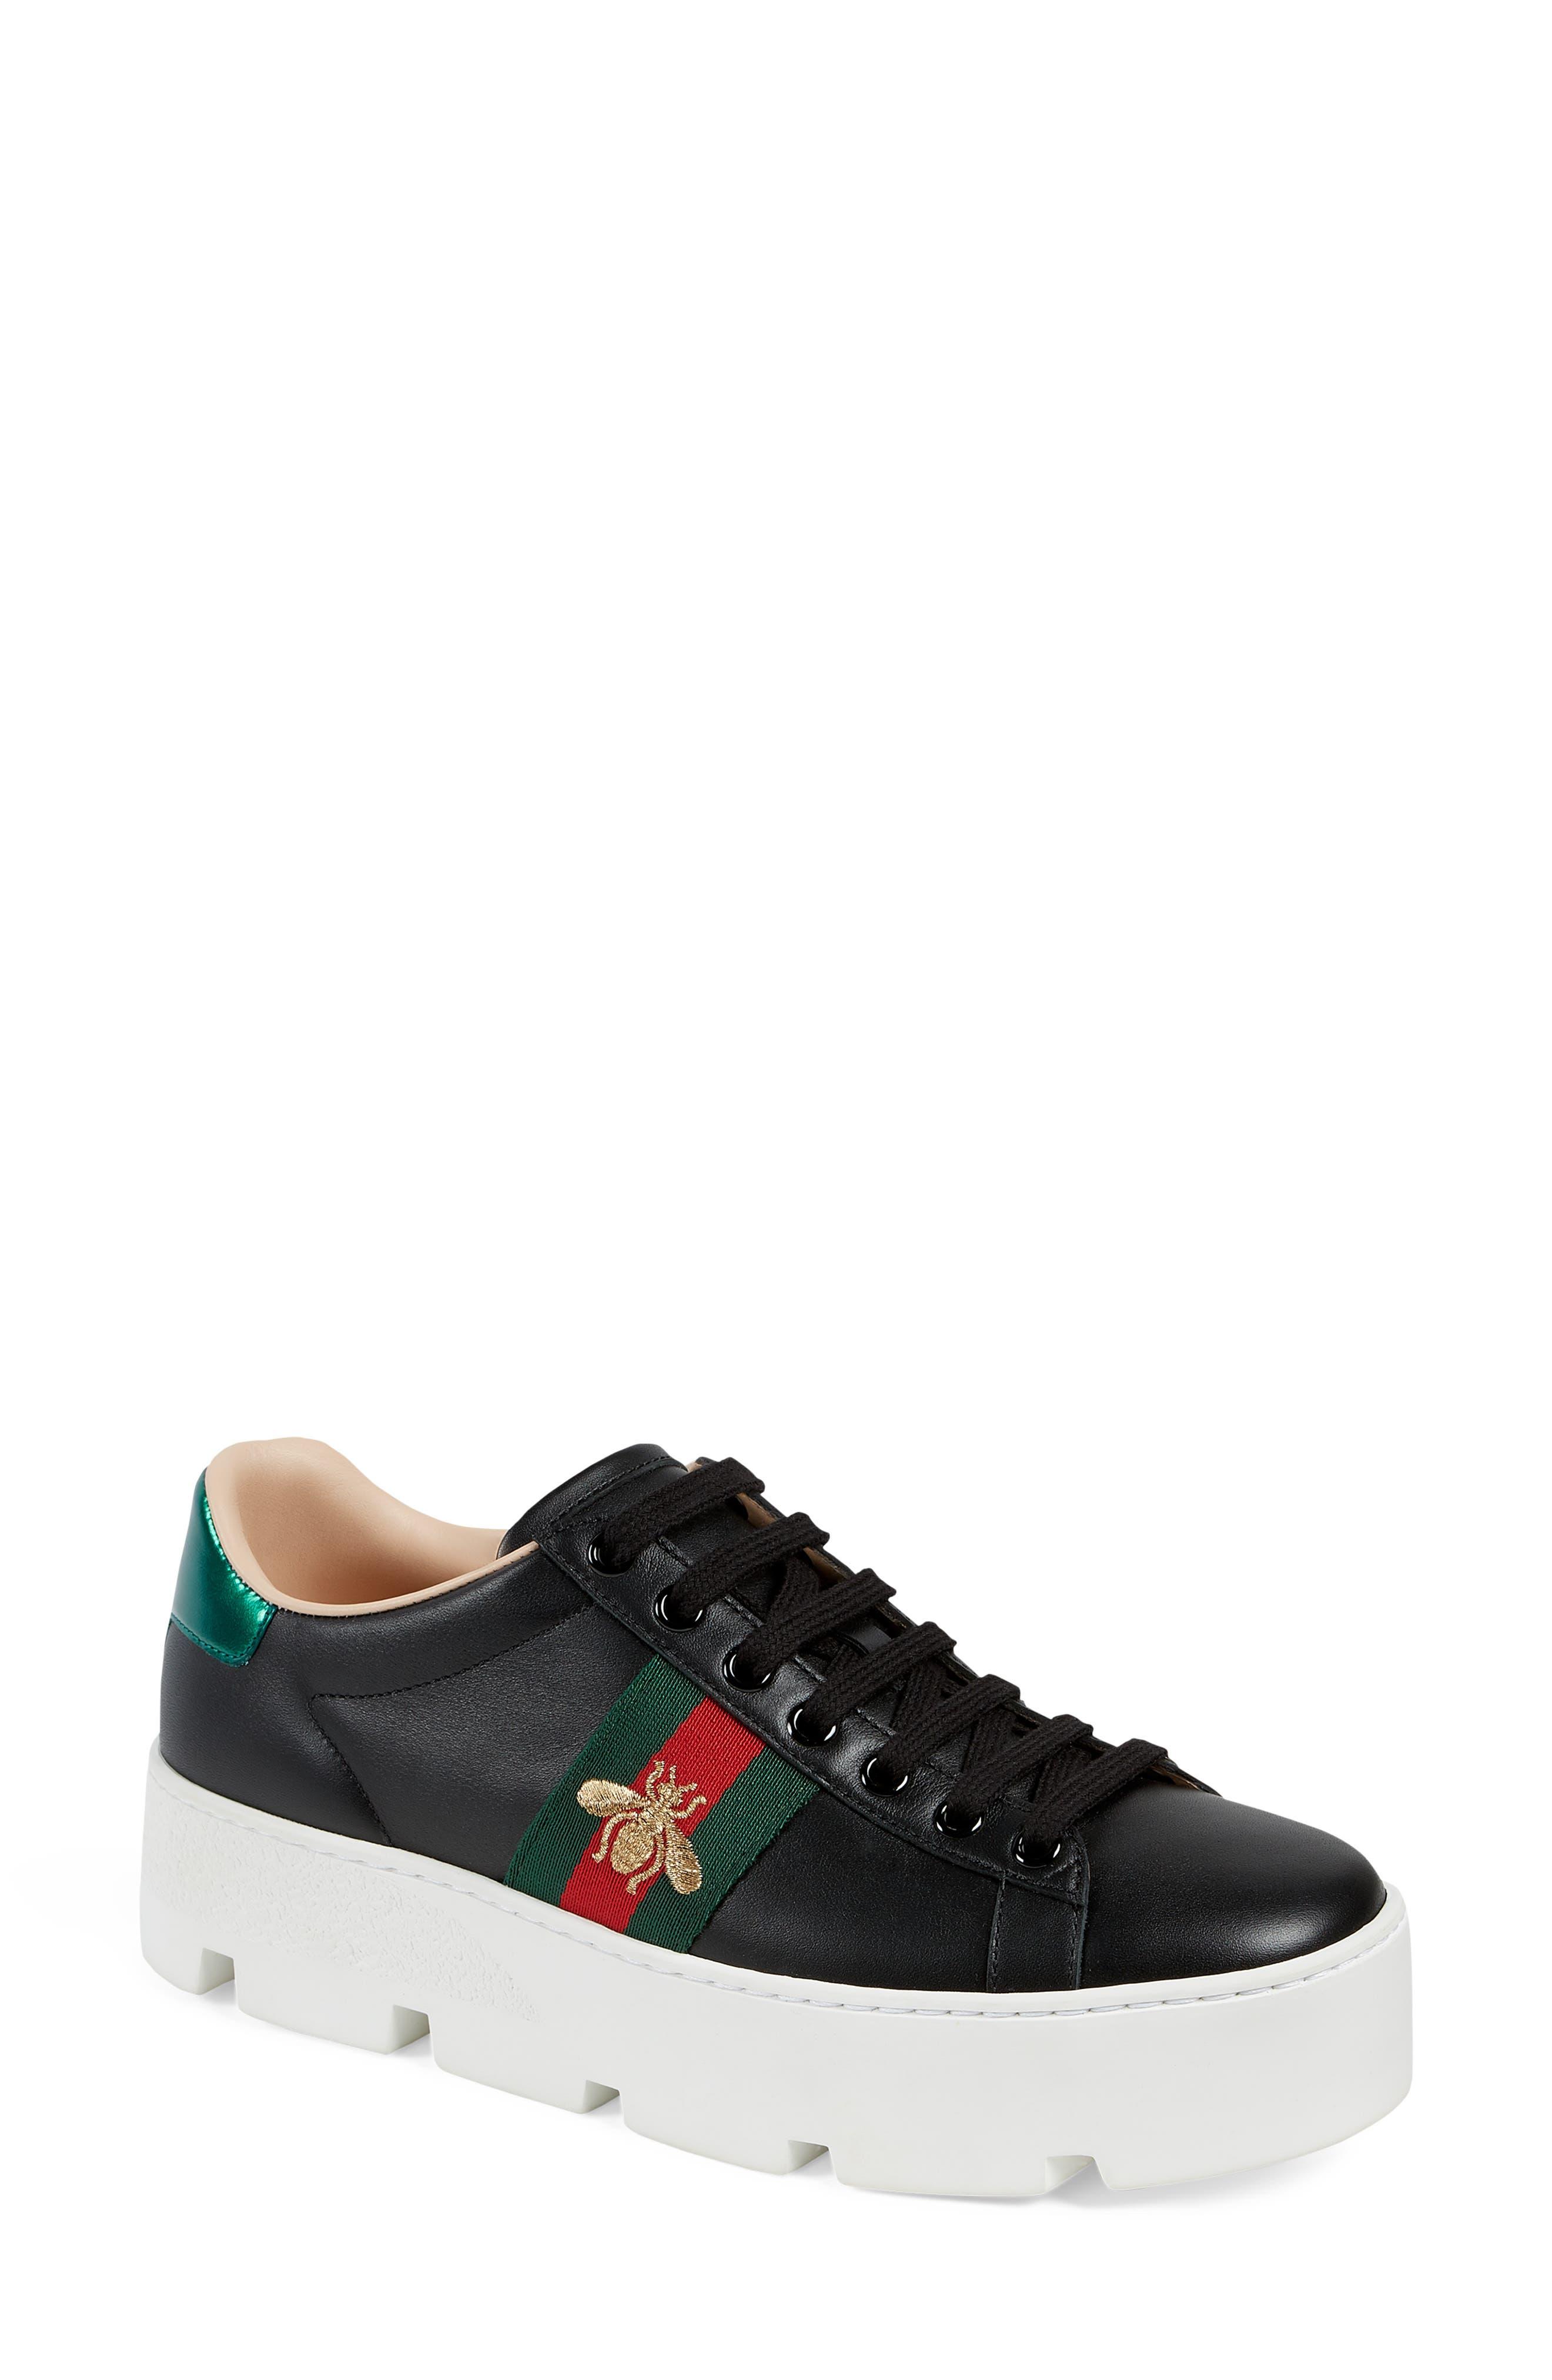 Gucci New Ace Platform Sneaker - Black